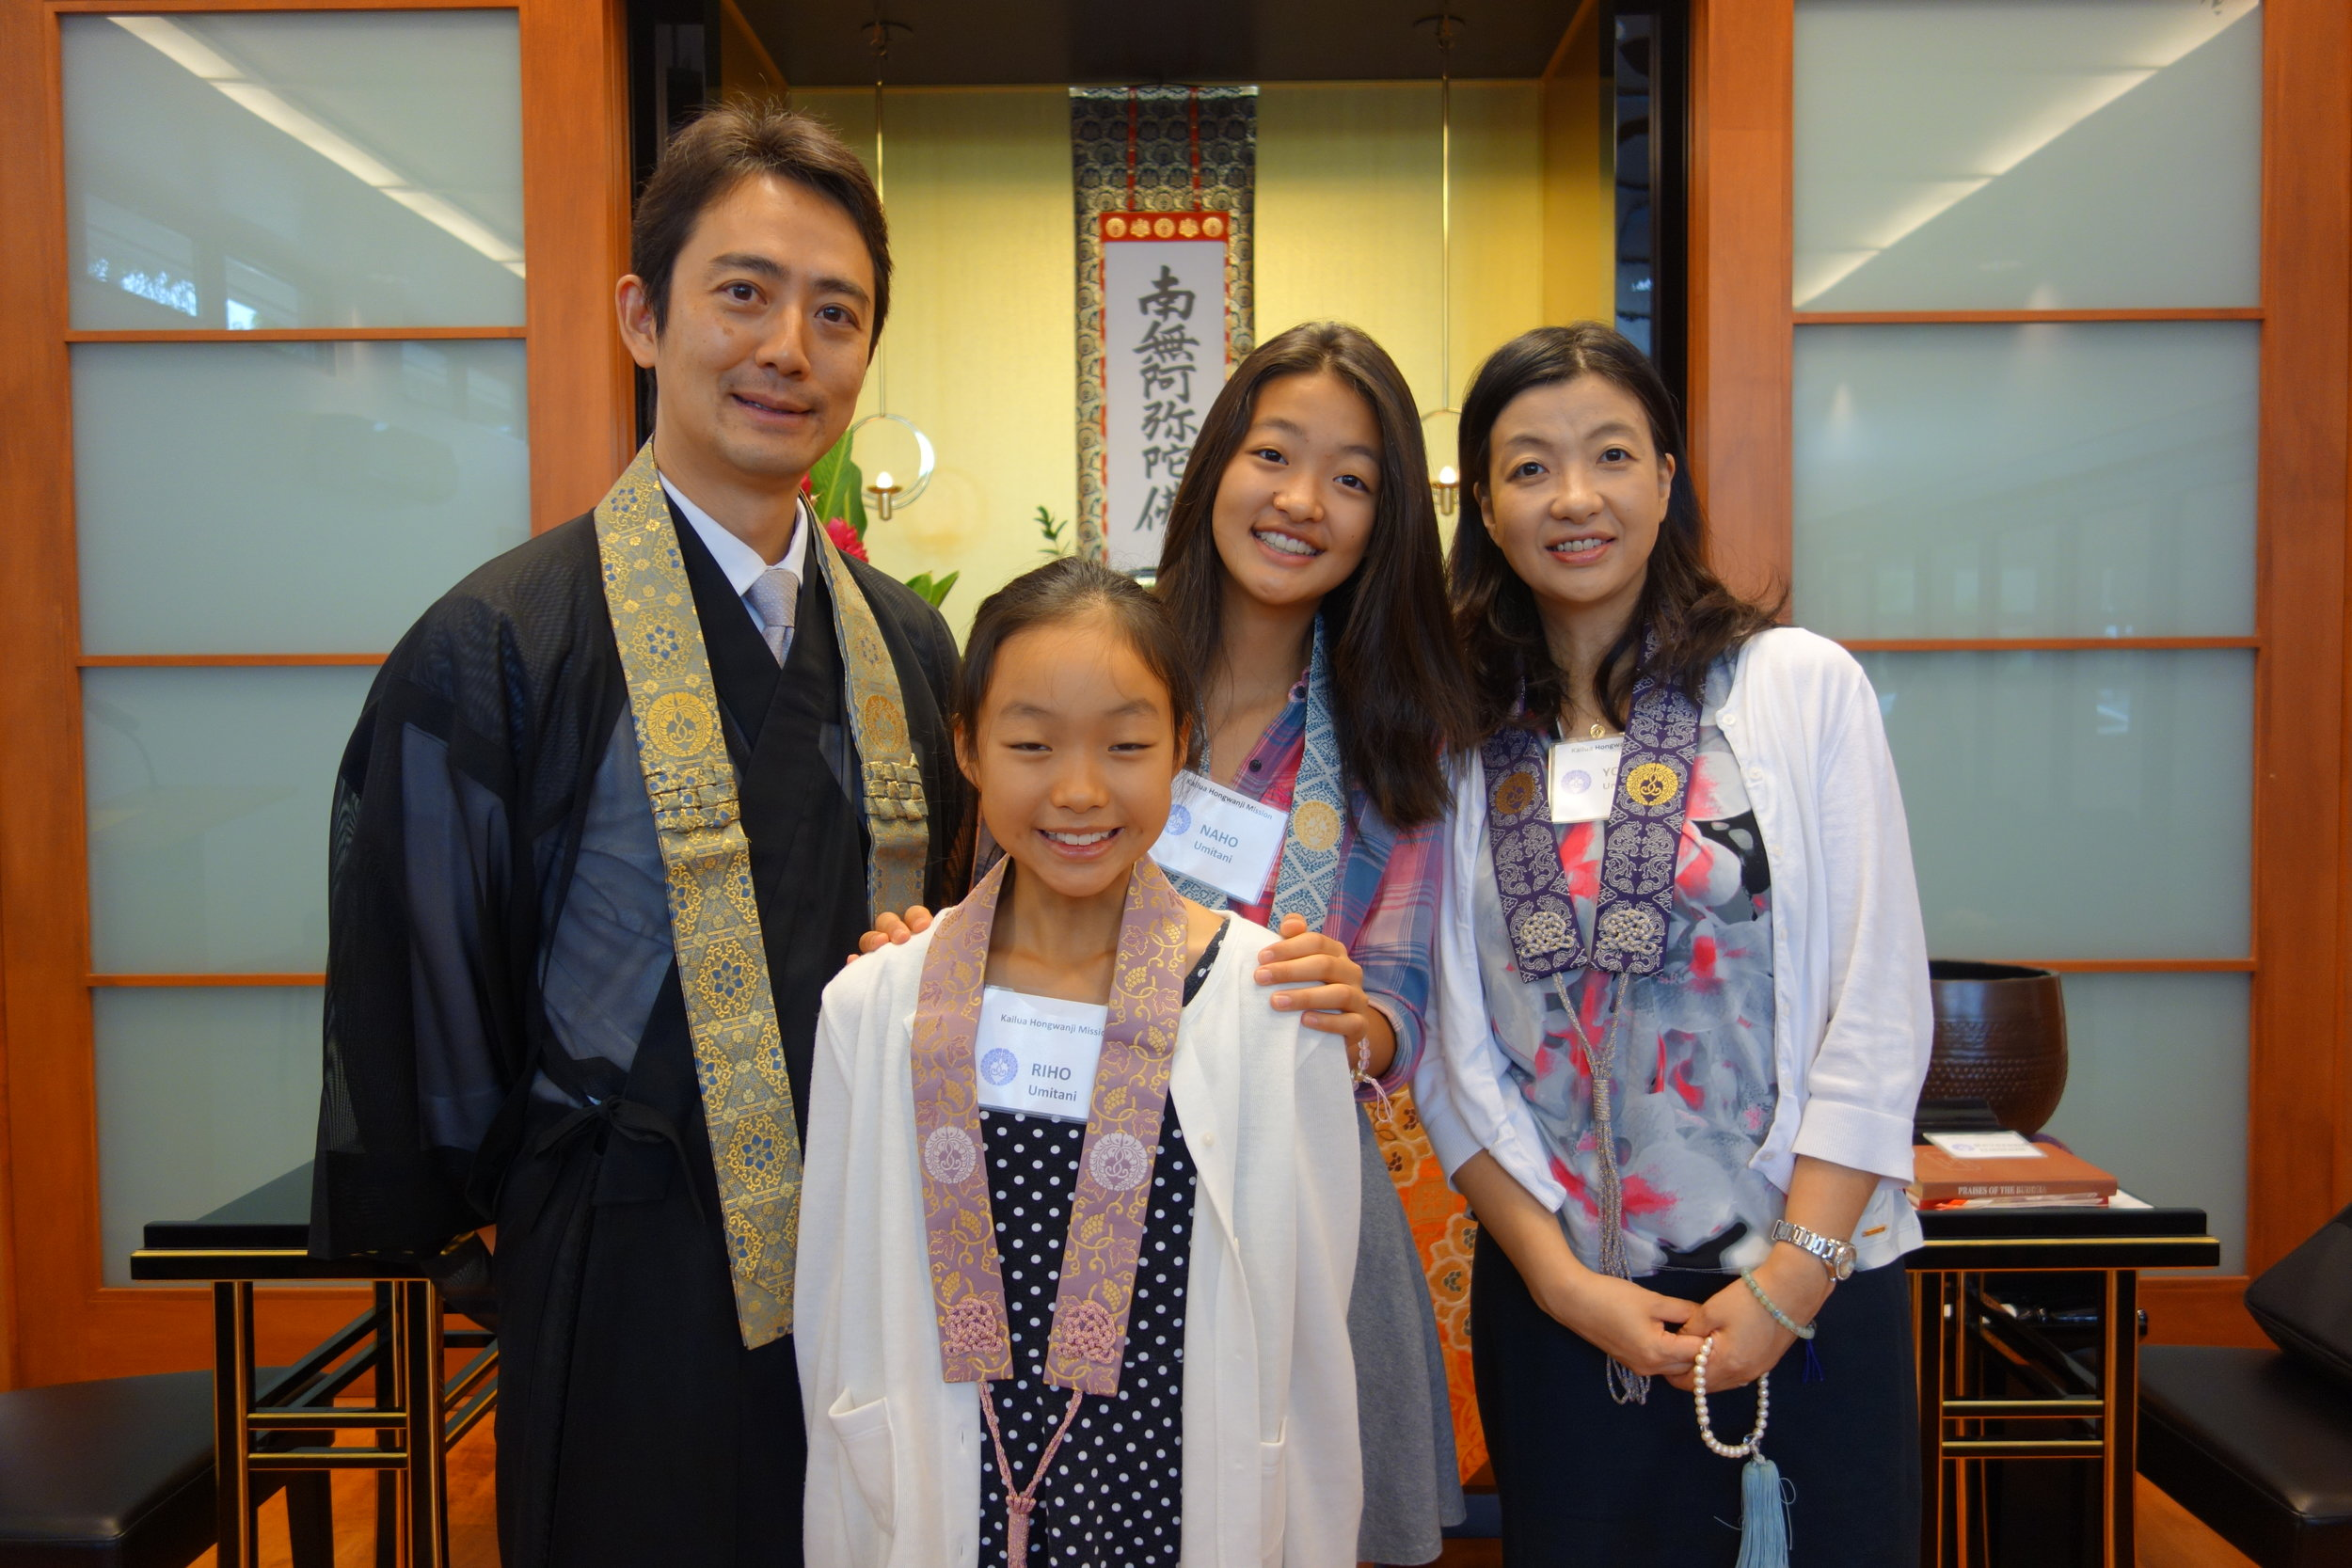 Rev. Umitani & family